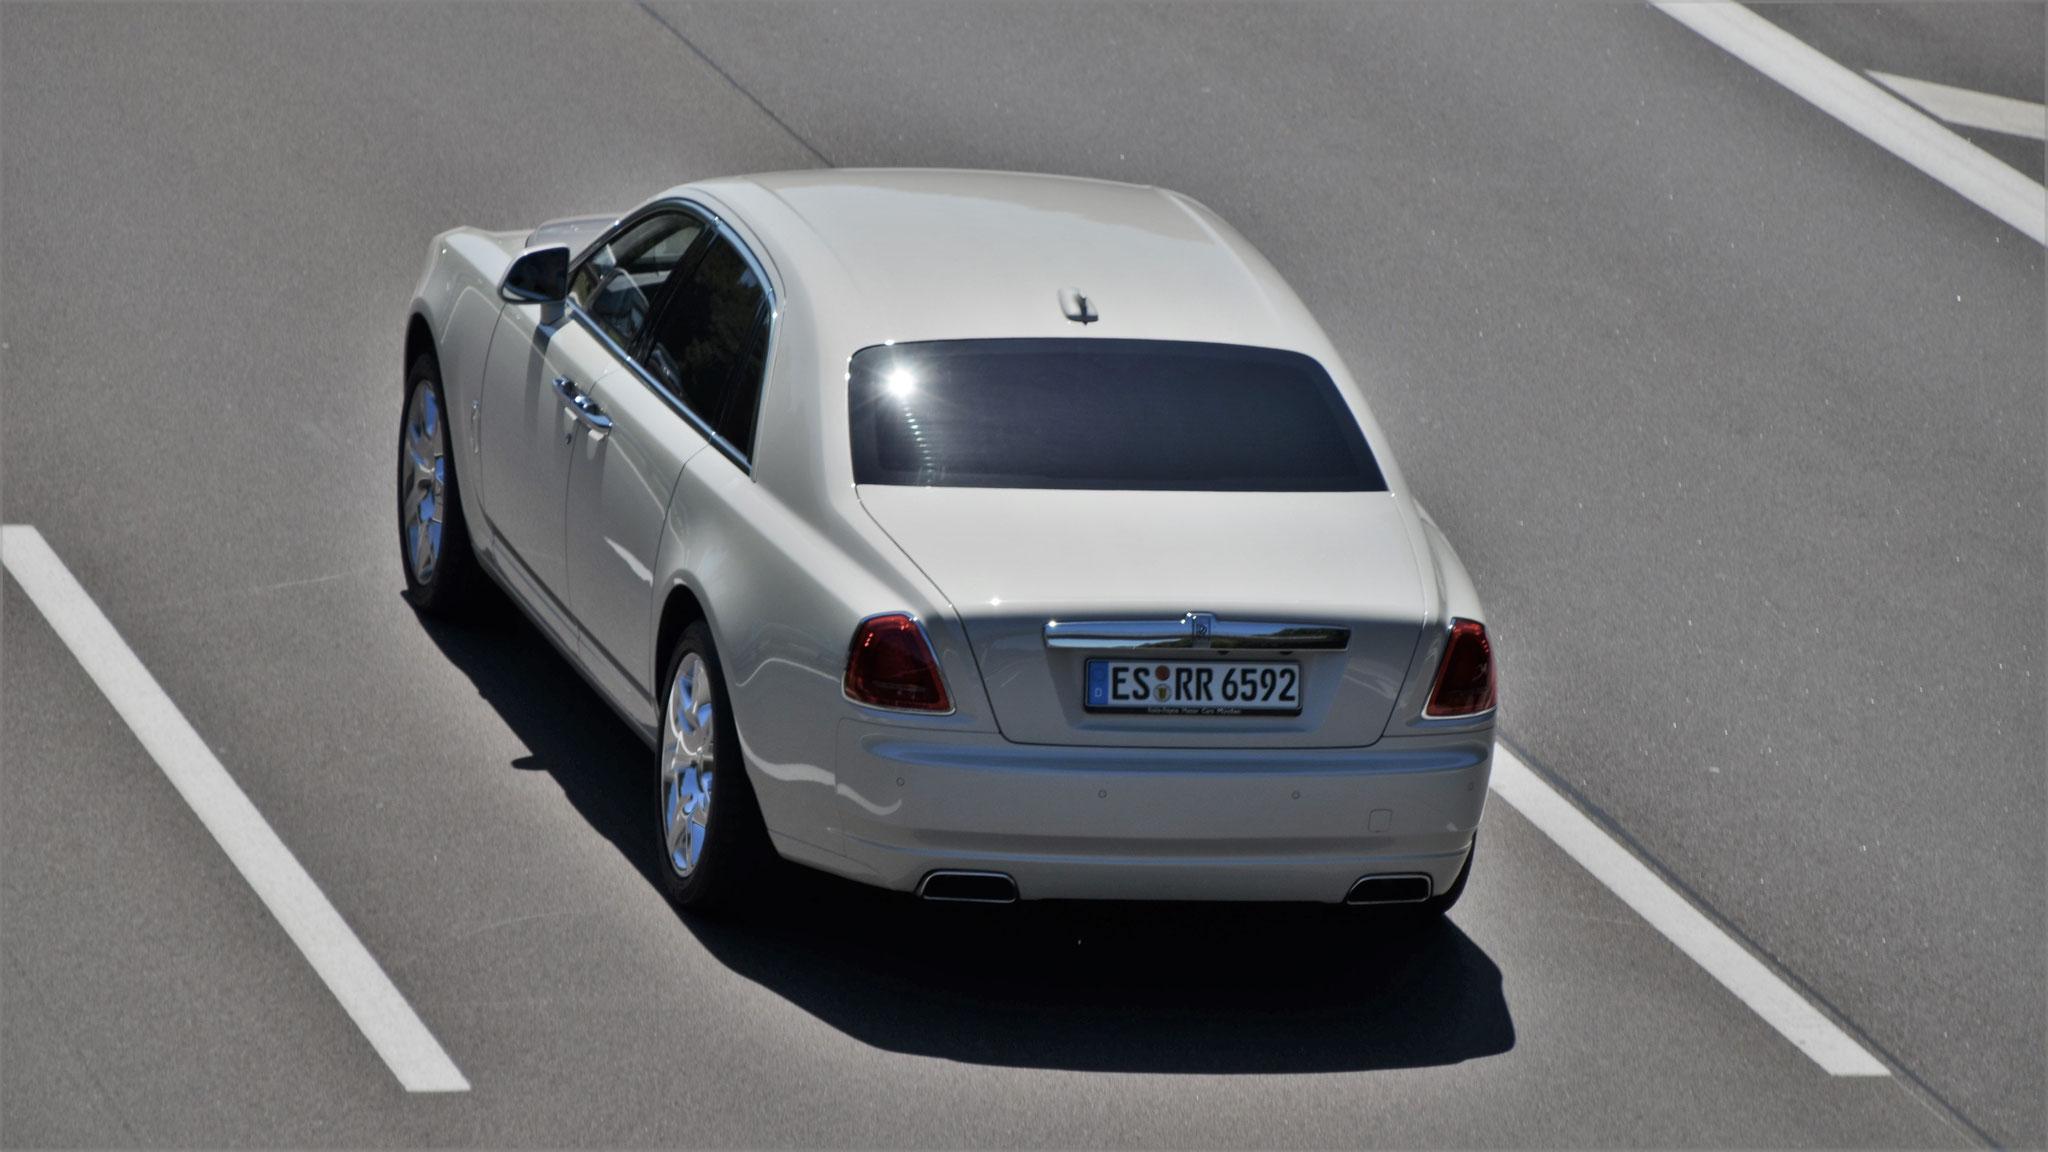 Rolls Royce Ghost - ES-RR-6592